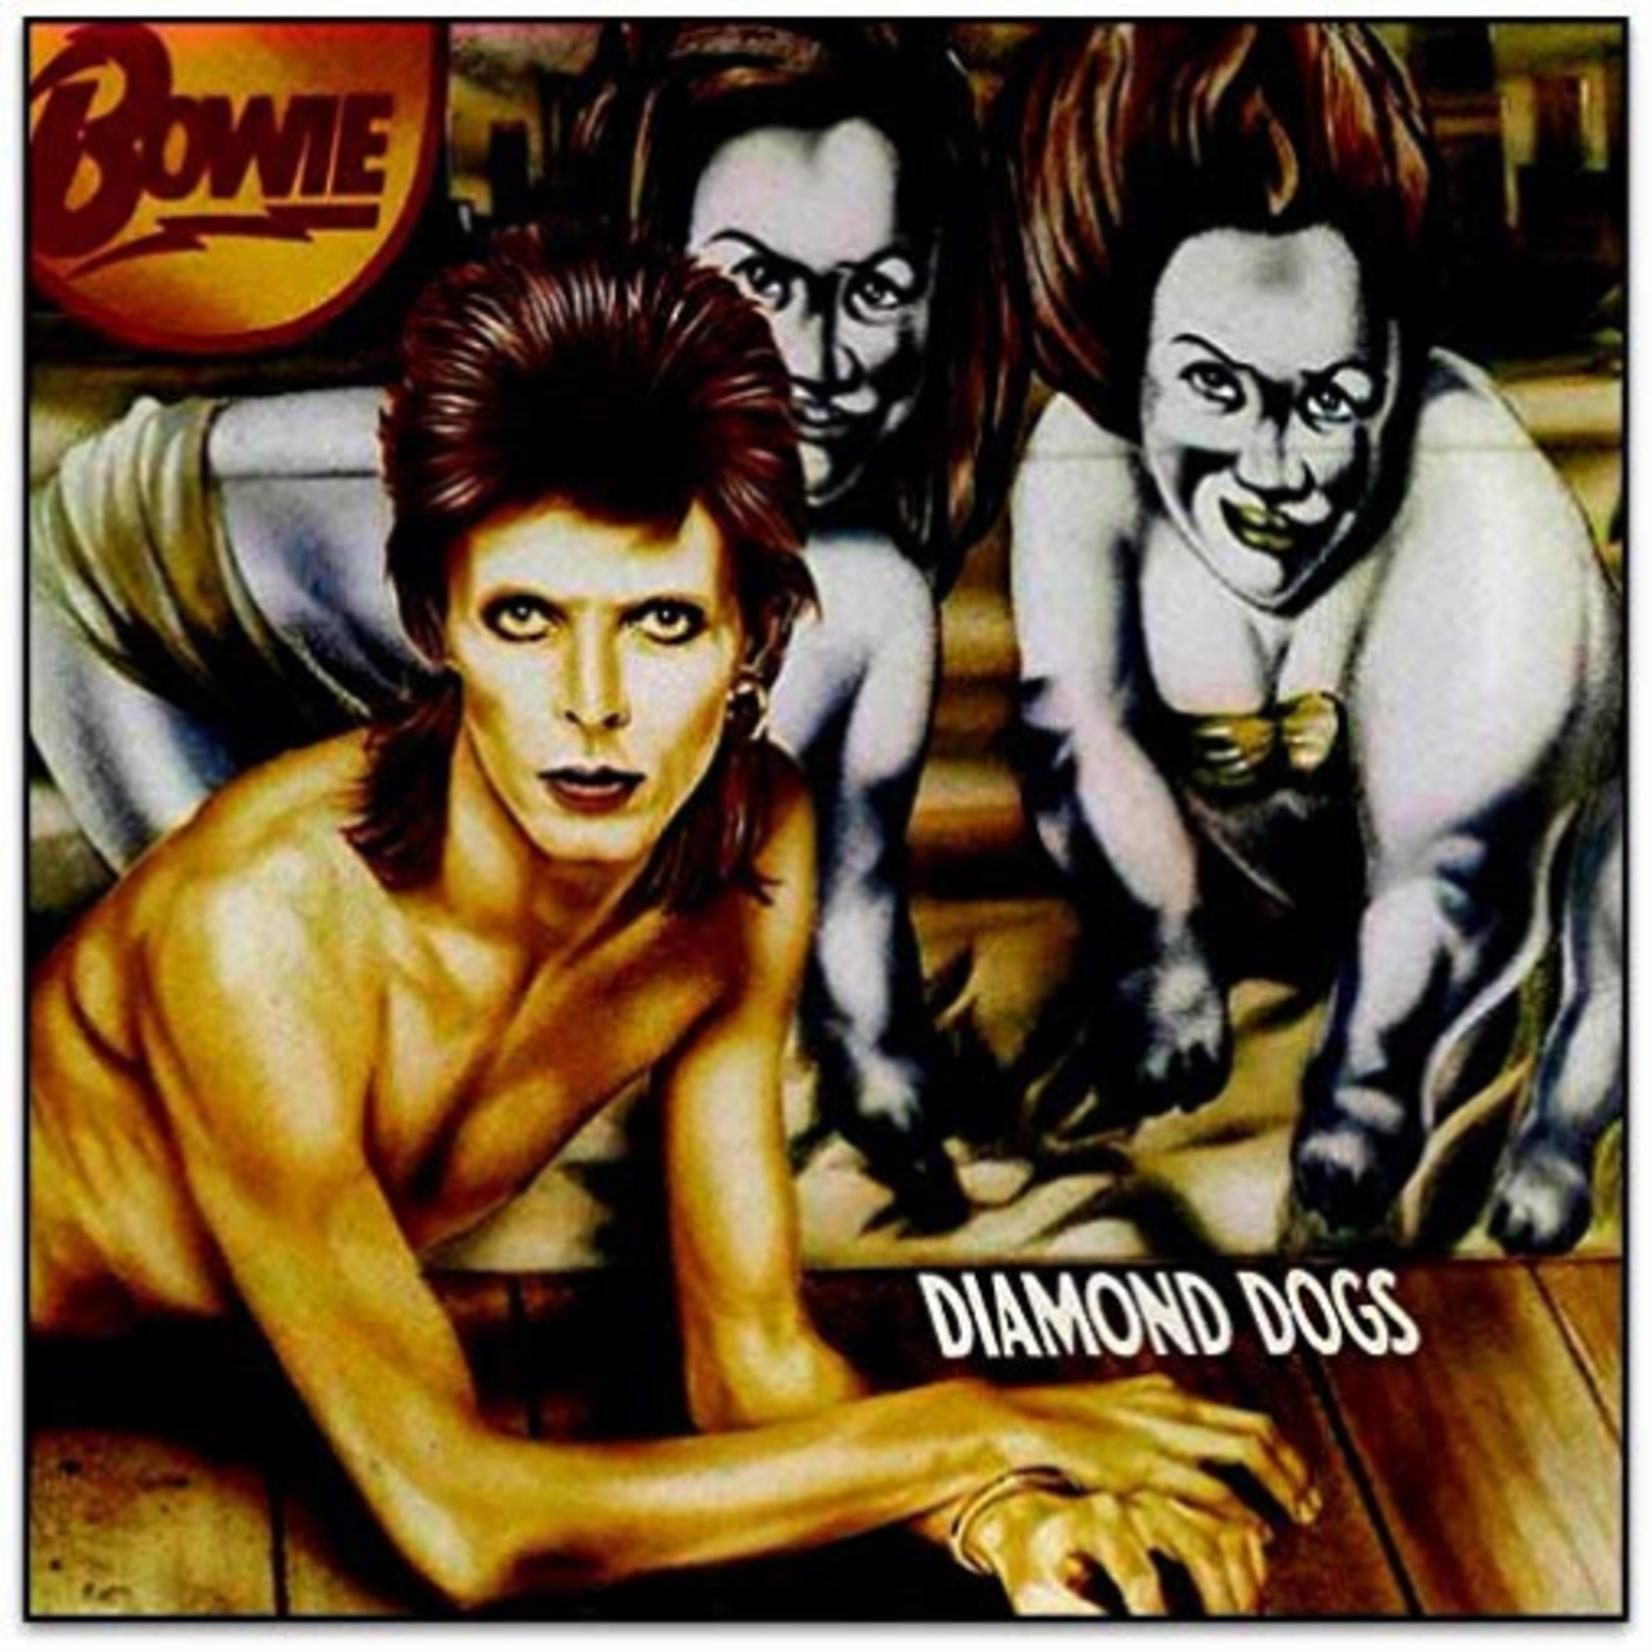 DAVID BOWIE DIAMOND DOGS (45TH ANNIVERSARY)